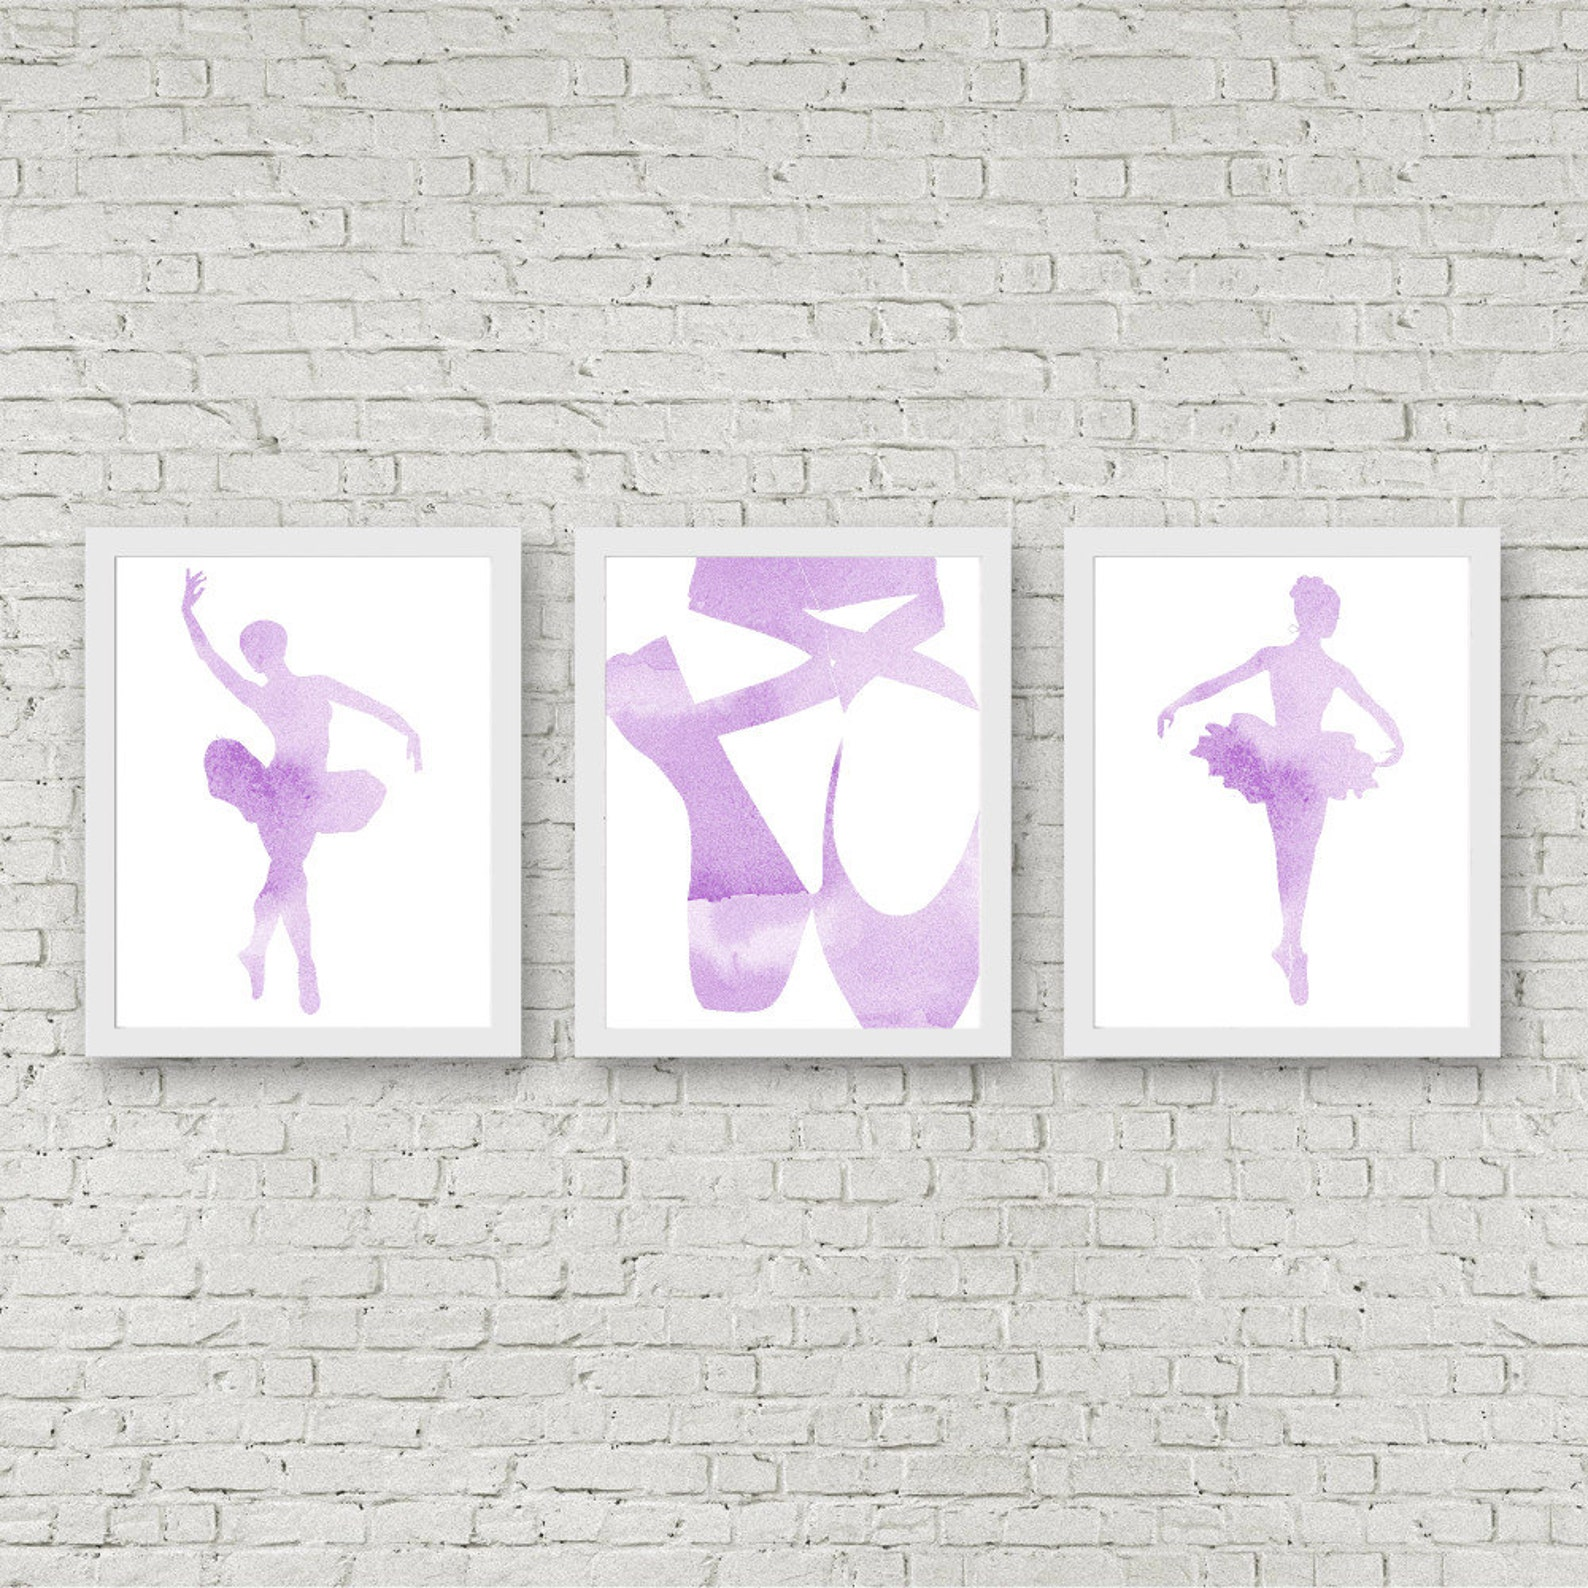 set of 3 art prints - watercolor ballet dancers wall art - ballerina nursery decor - ballet pointe shoes - lavender / purple art